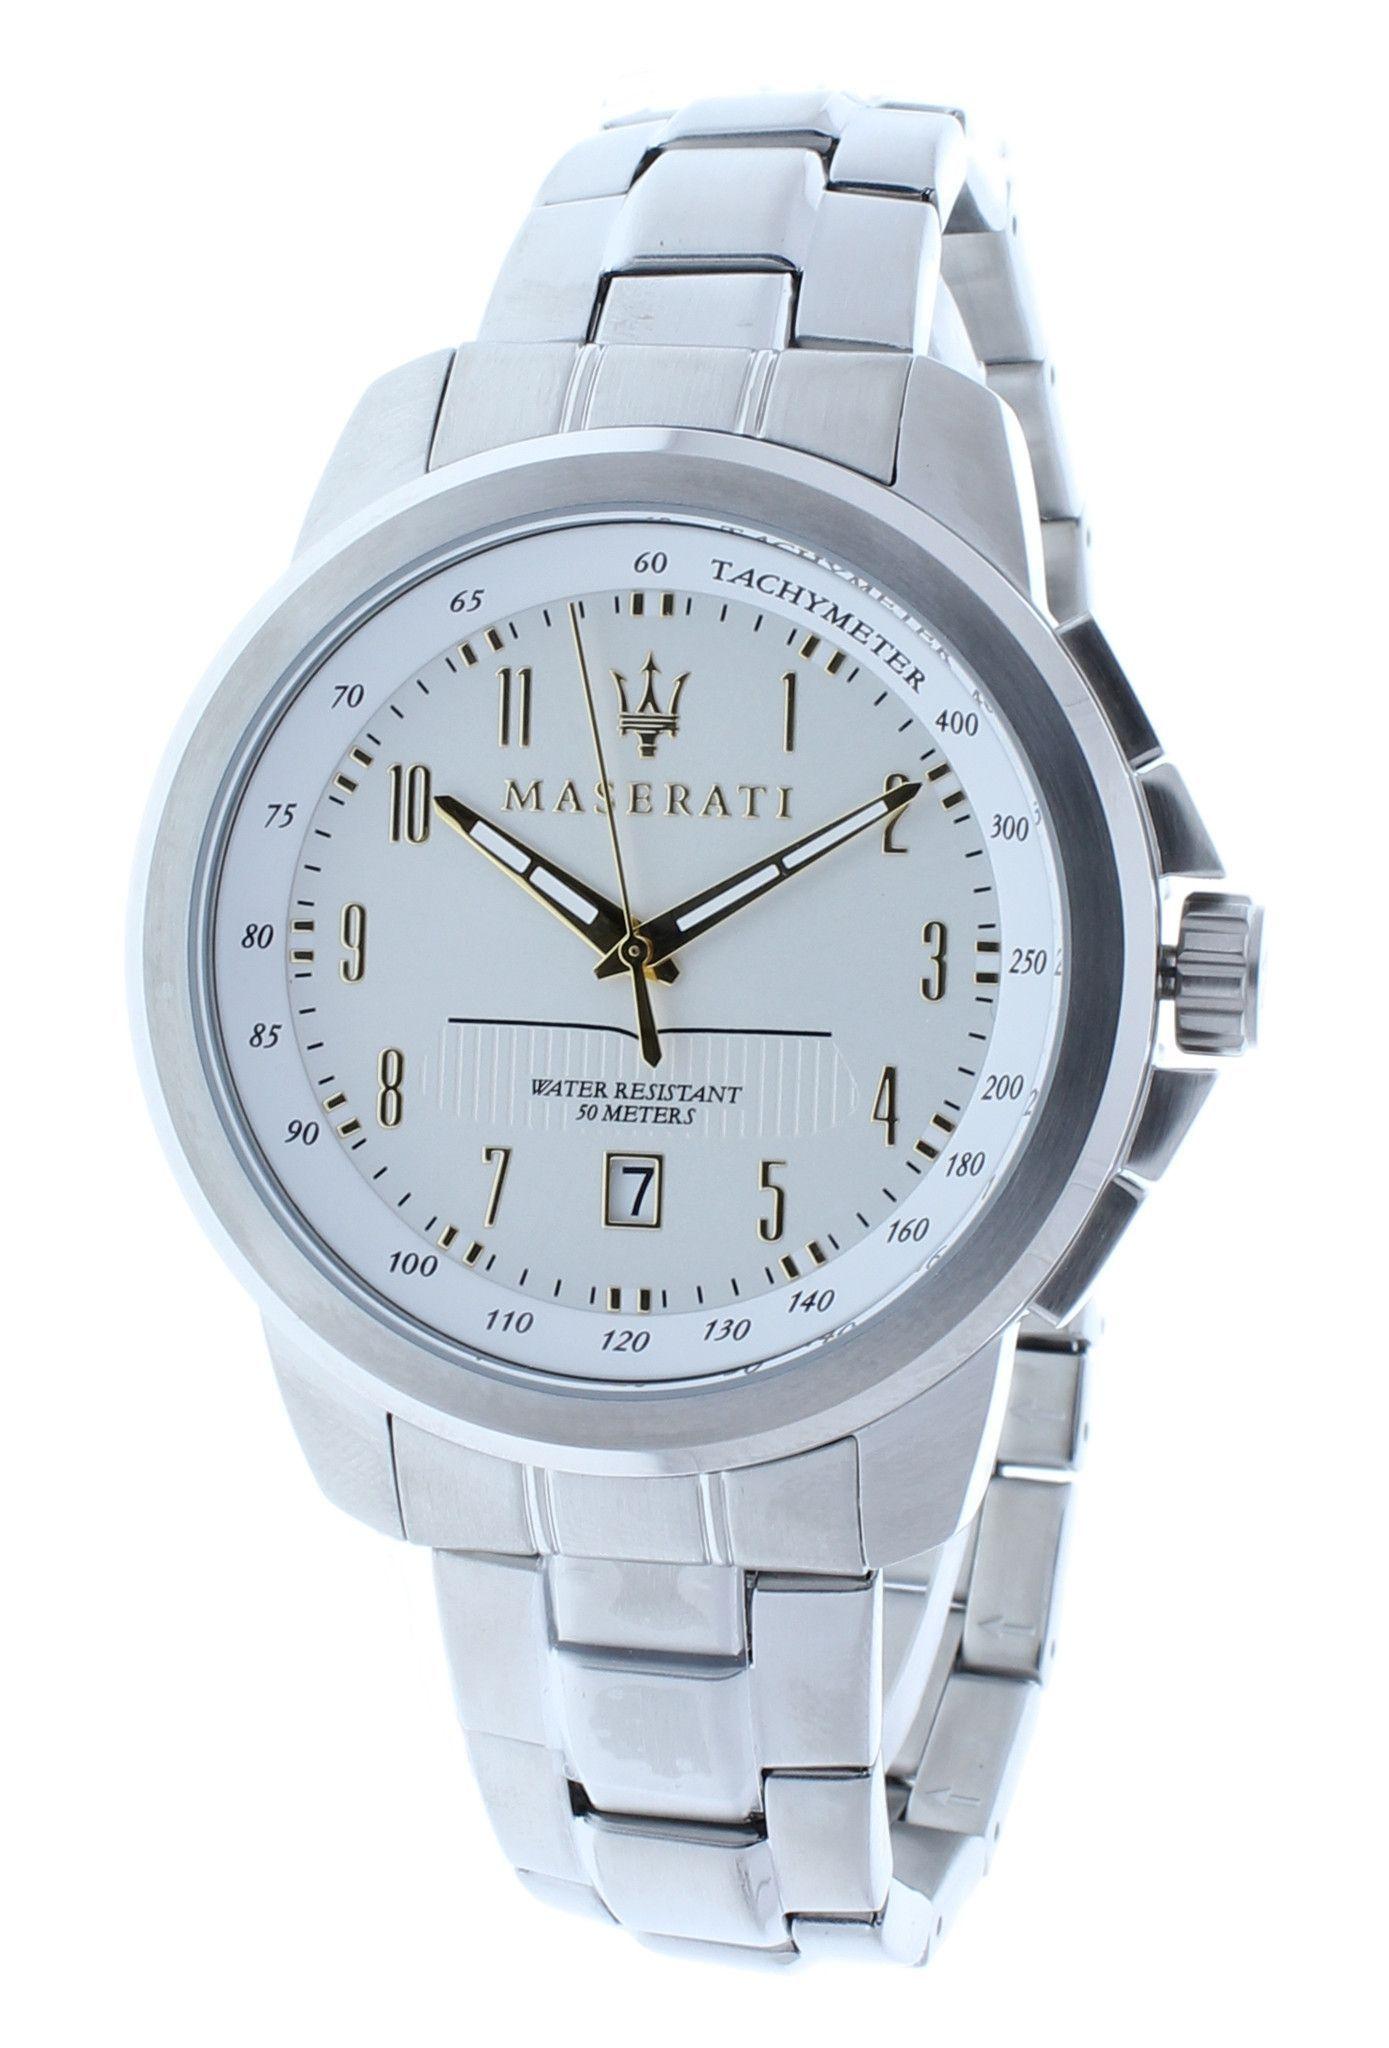 Maserati R8853121001 Men's Quartz White Dial Watch Stainless Steel Case Date